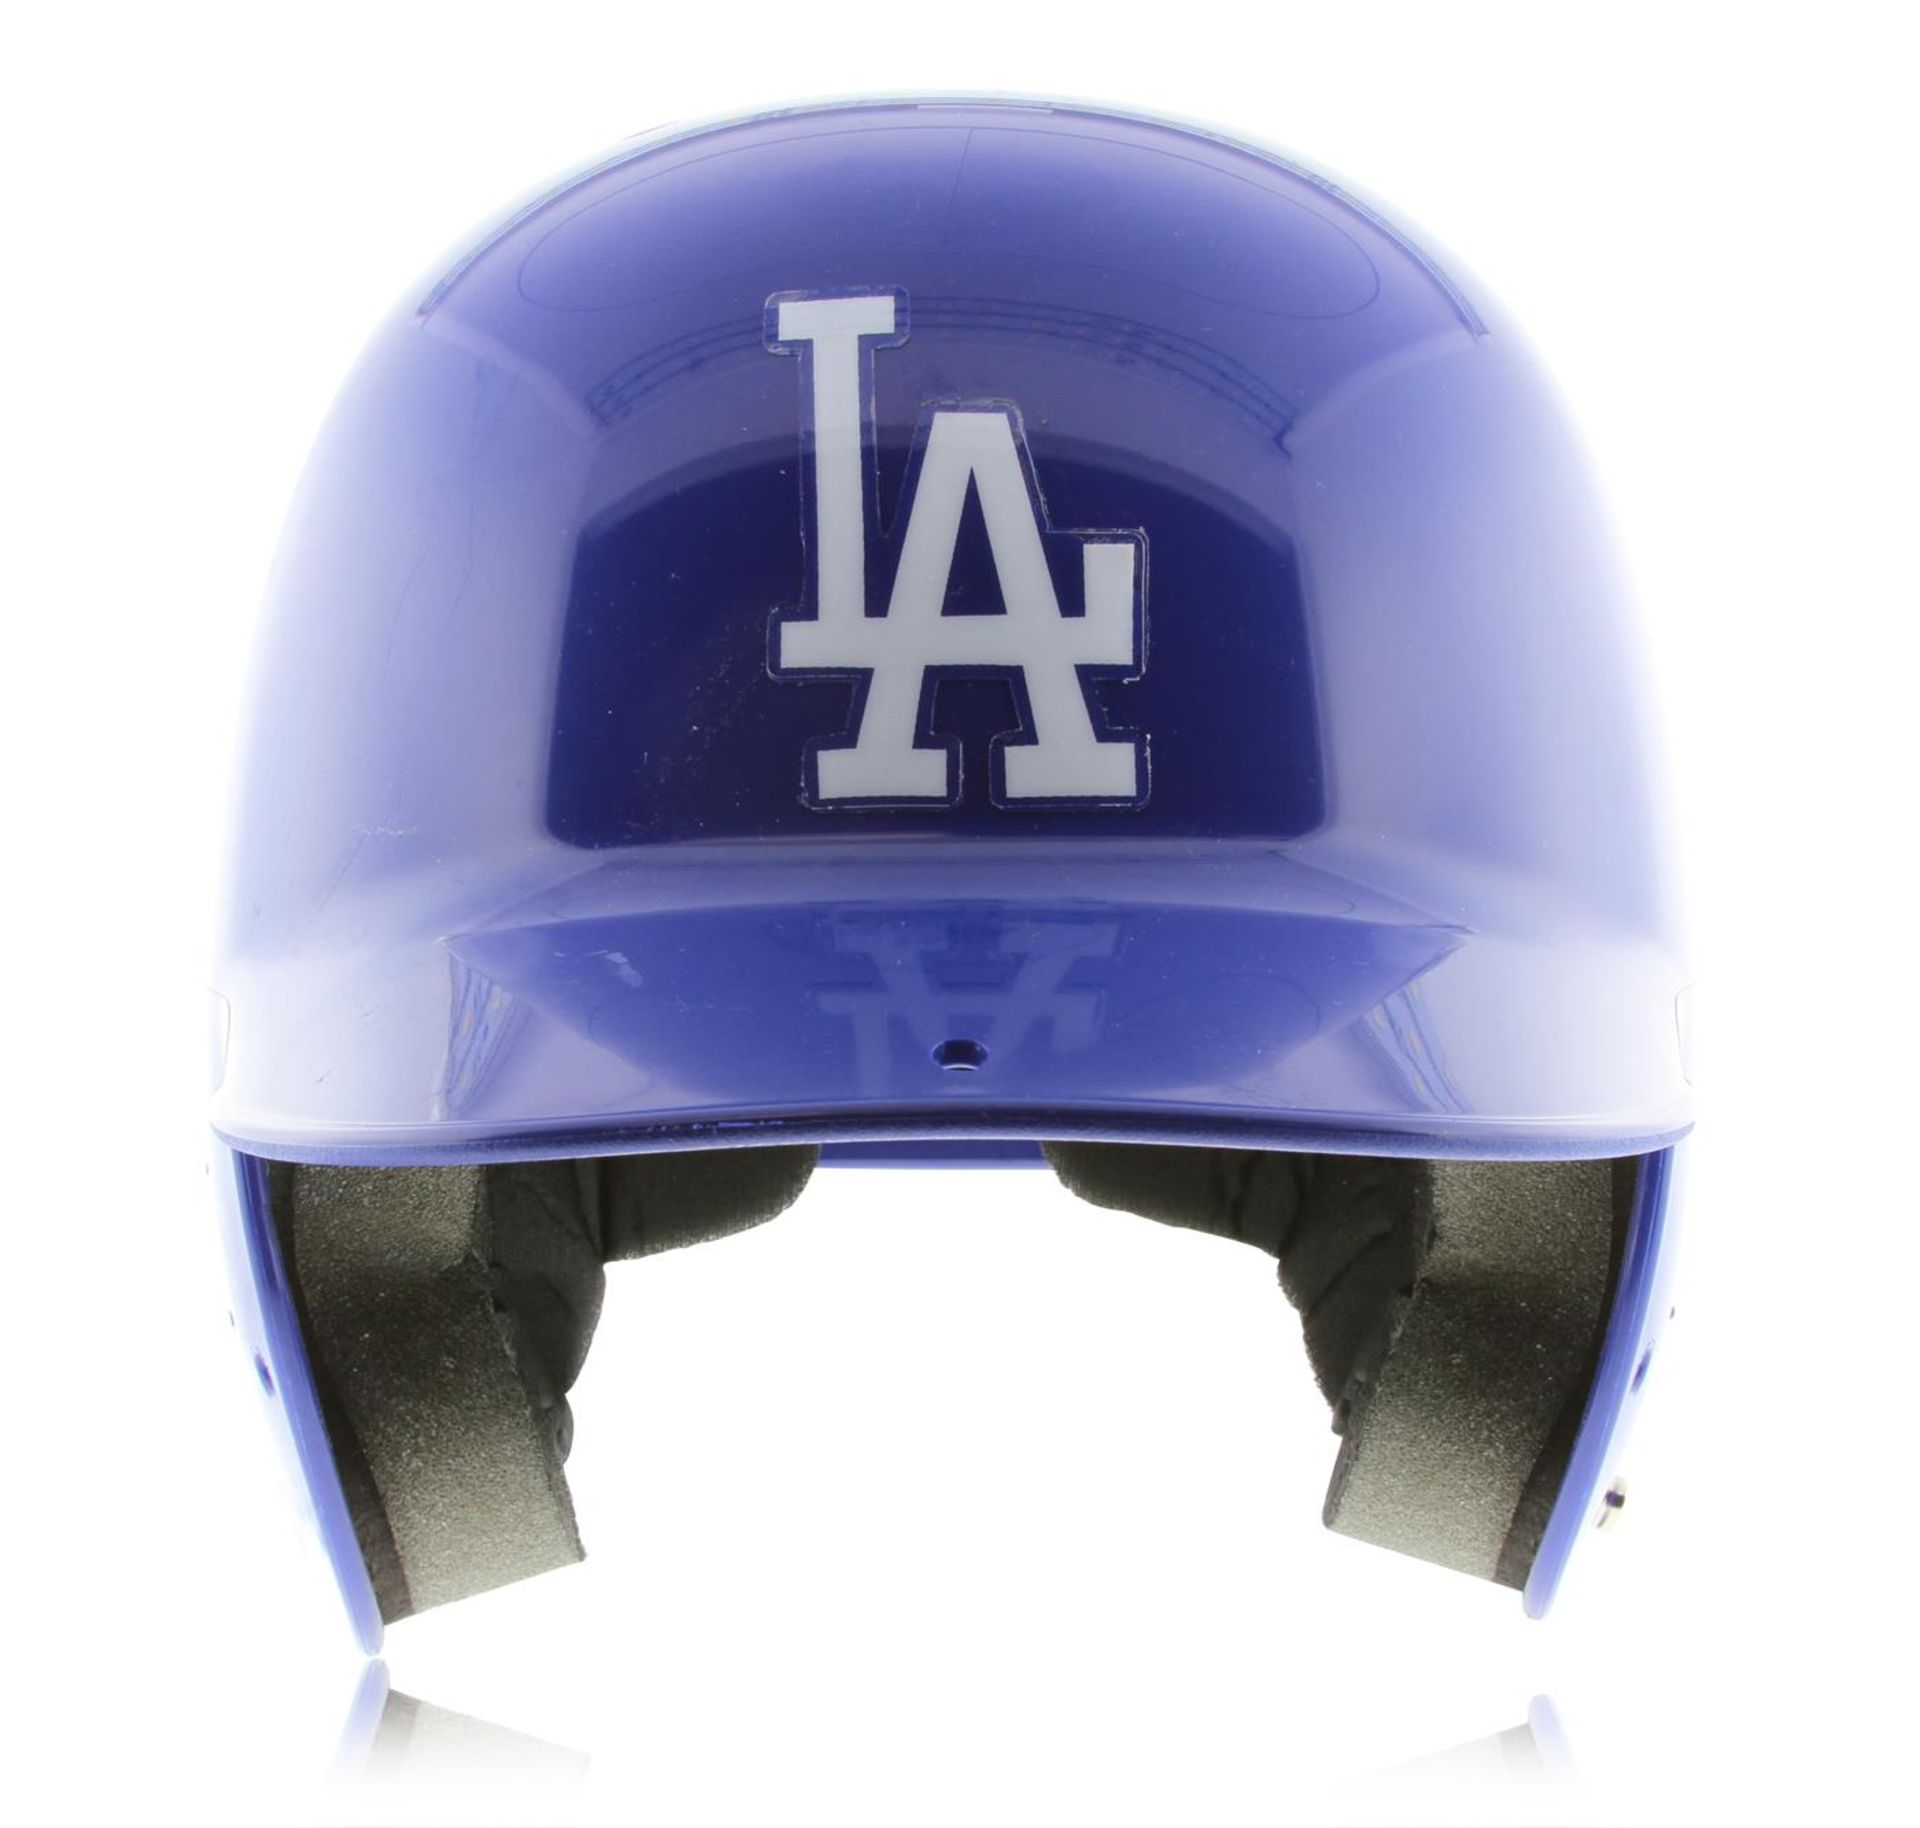 Autographed Duke Snider LA Dodgers Helmet PSA Certified - Image 2 of 4